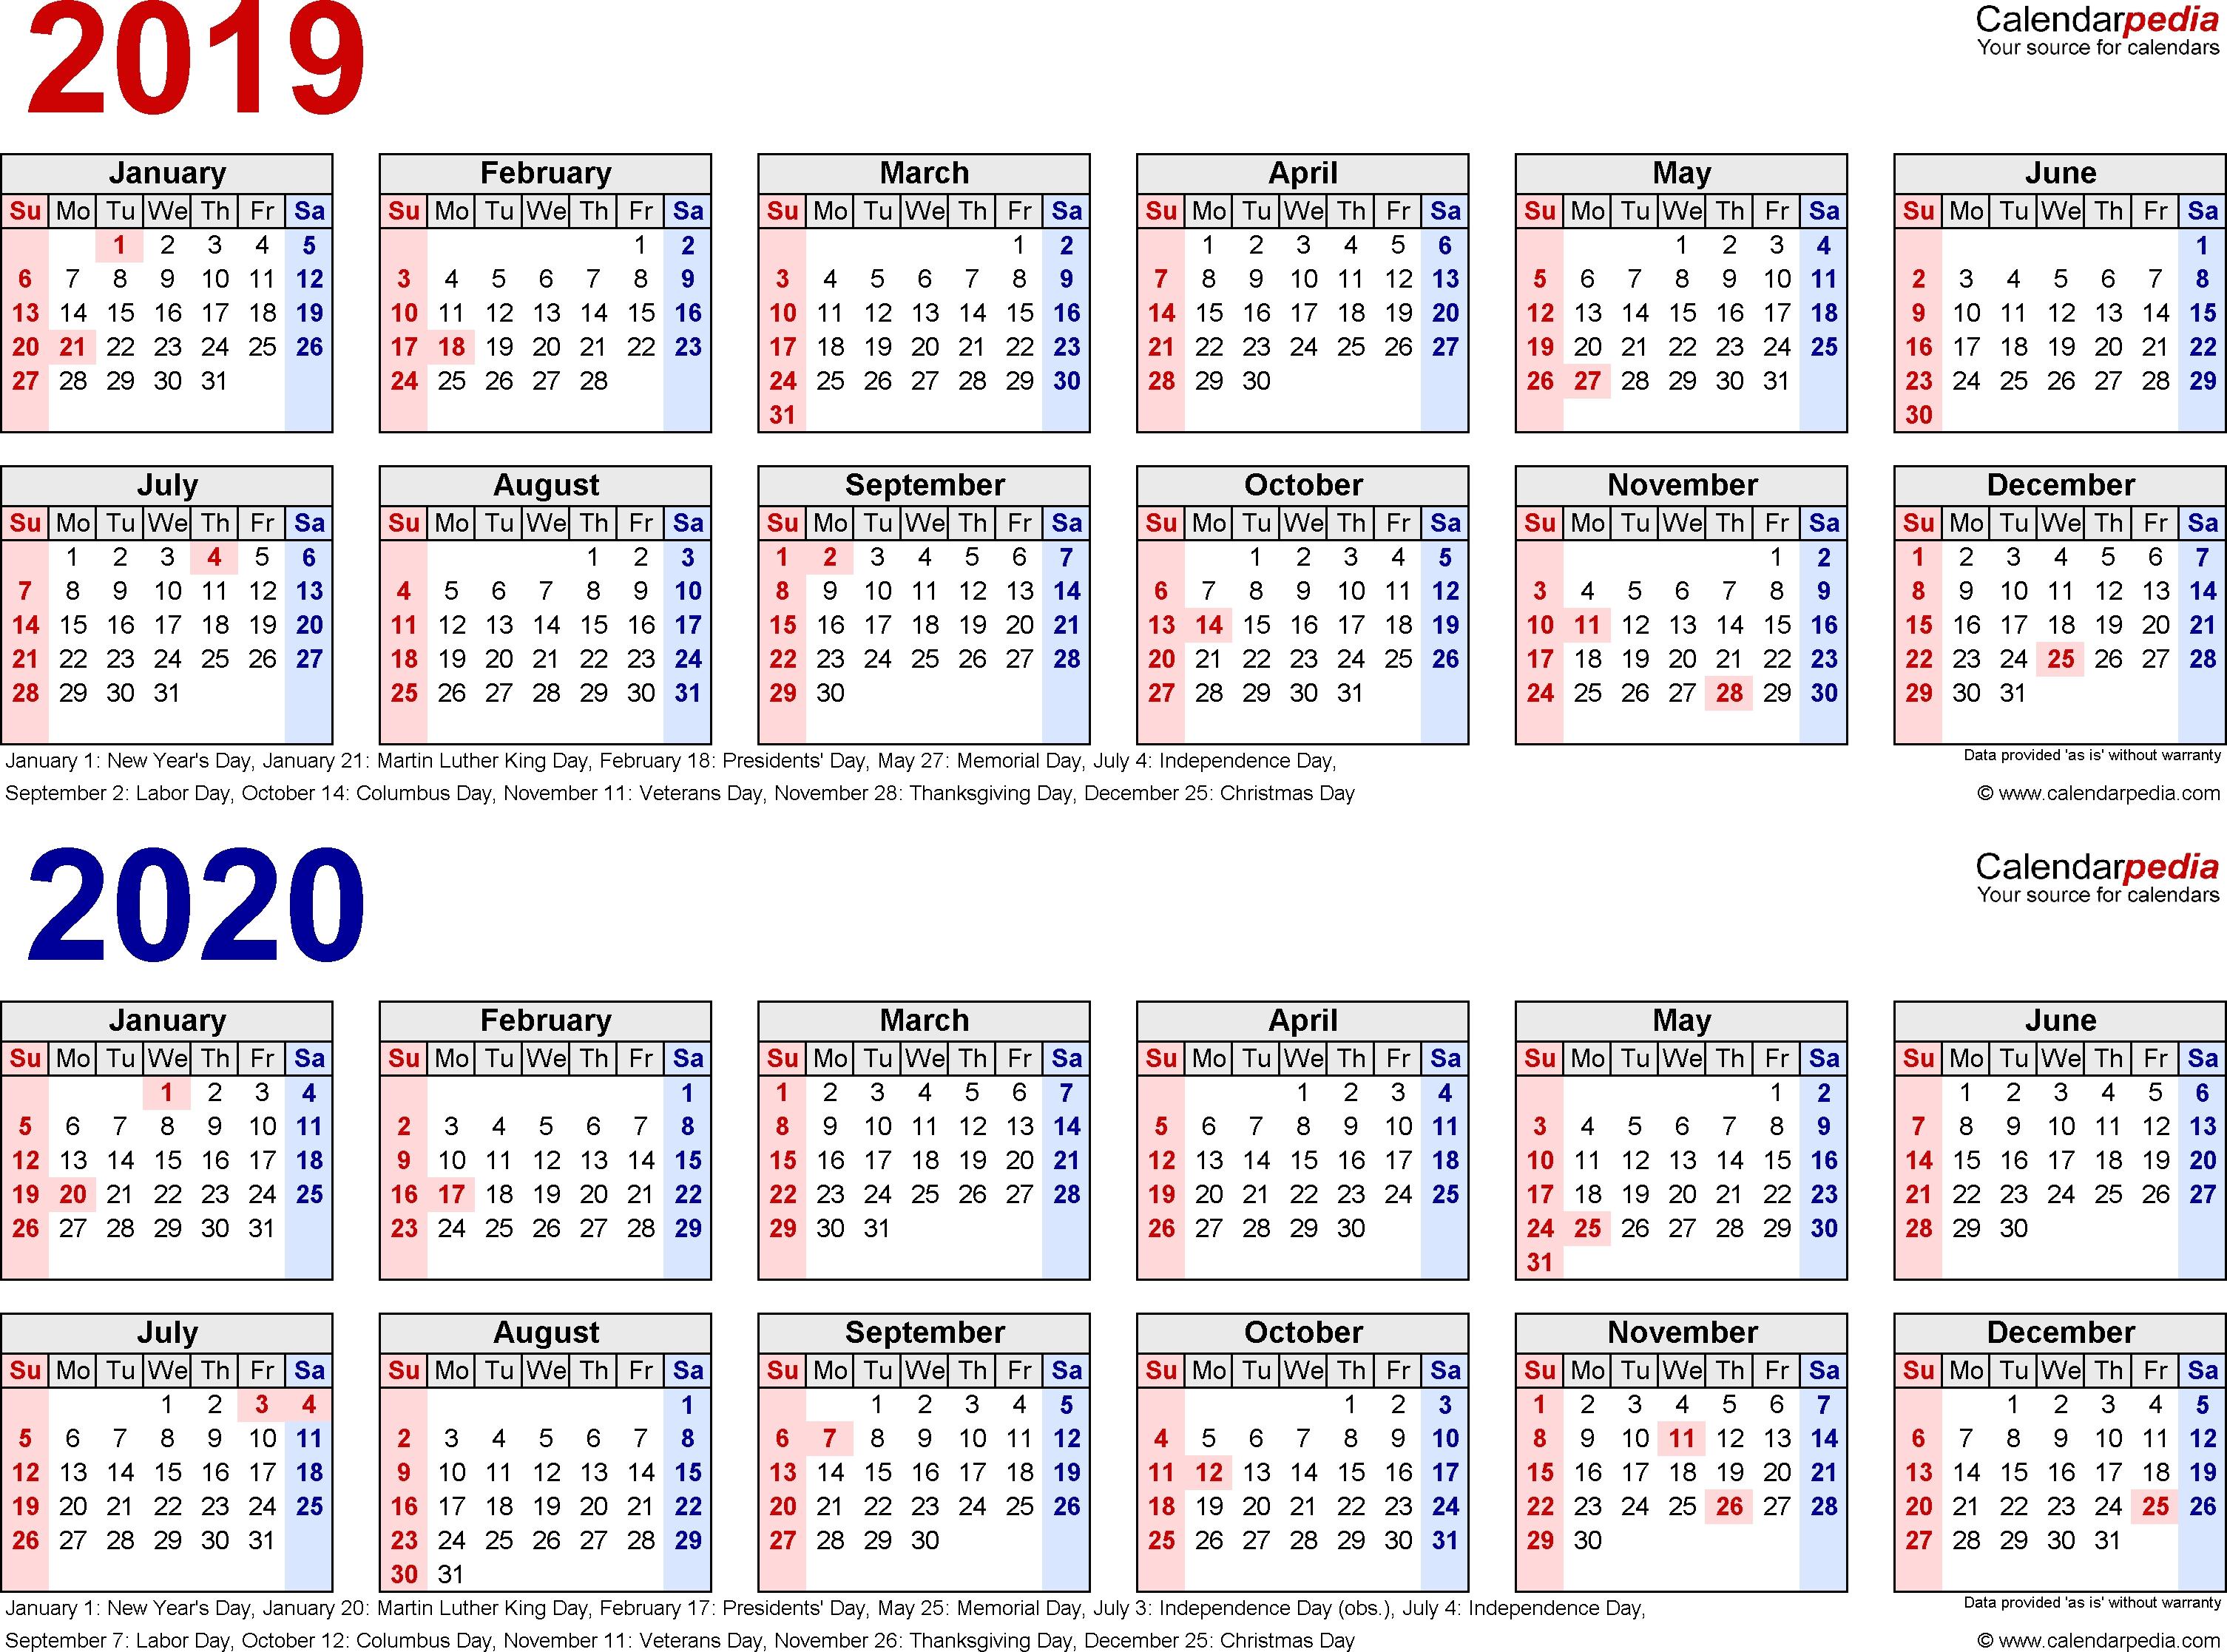 2019-2020 Calendar - Free Printable Two-Year Pdf Calendars inside Free Printaabke Calendars For 2019-2020